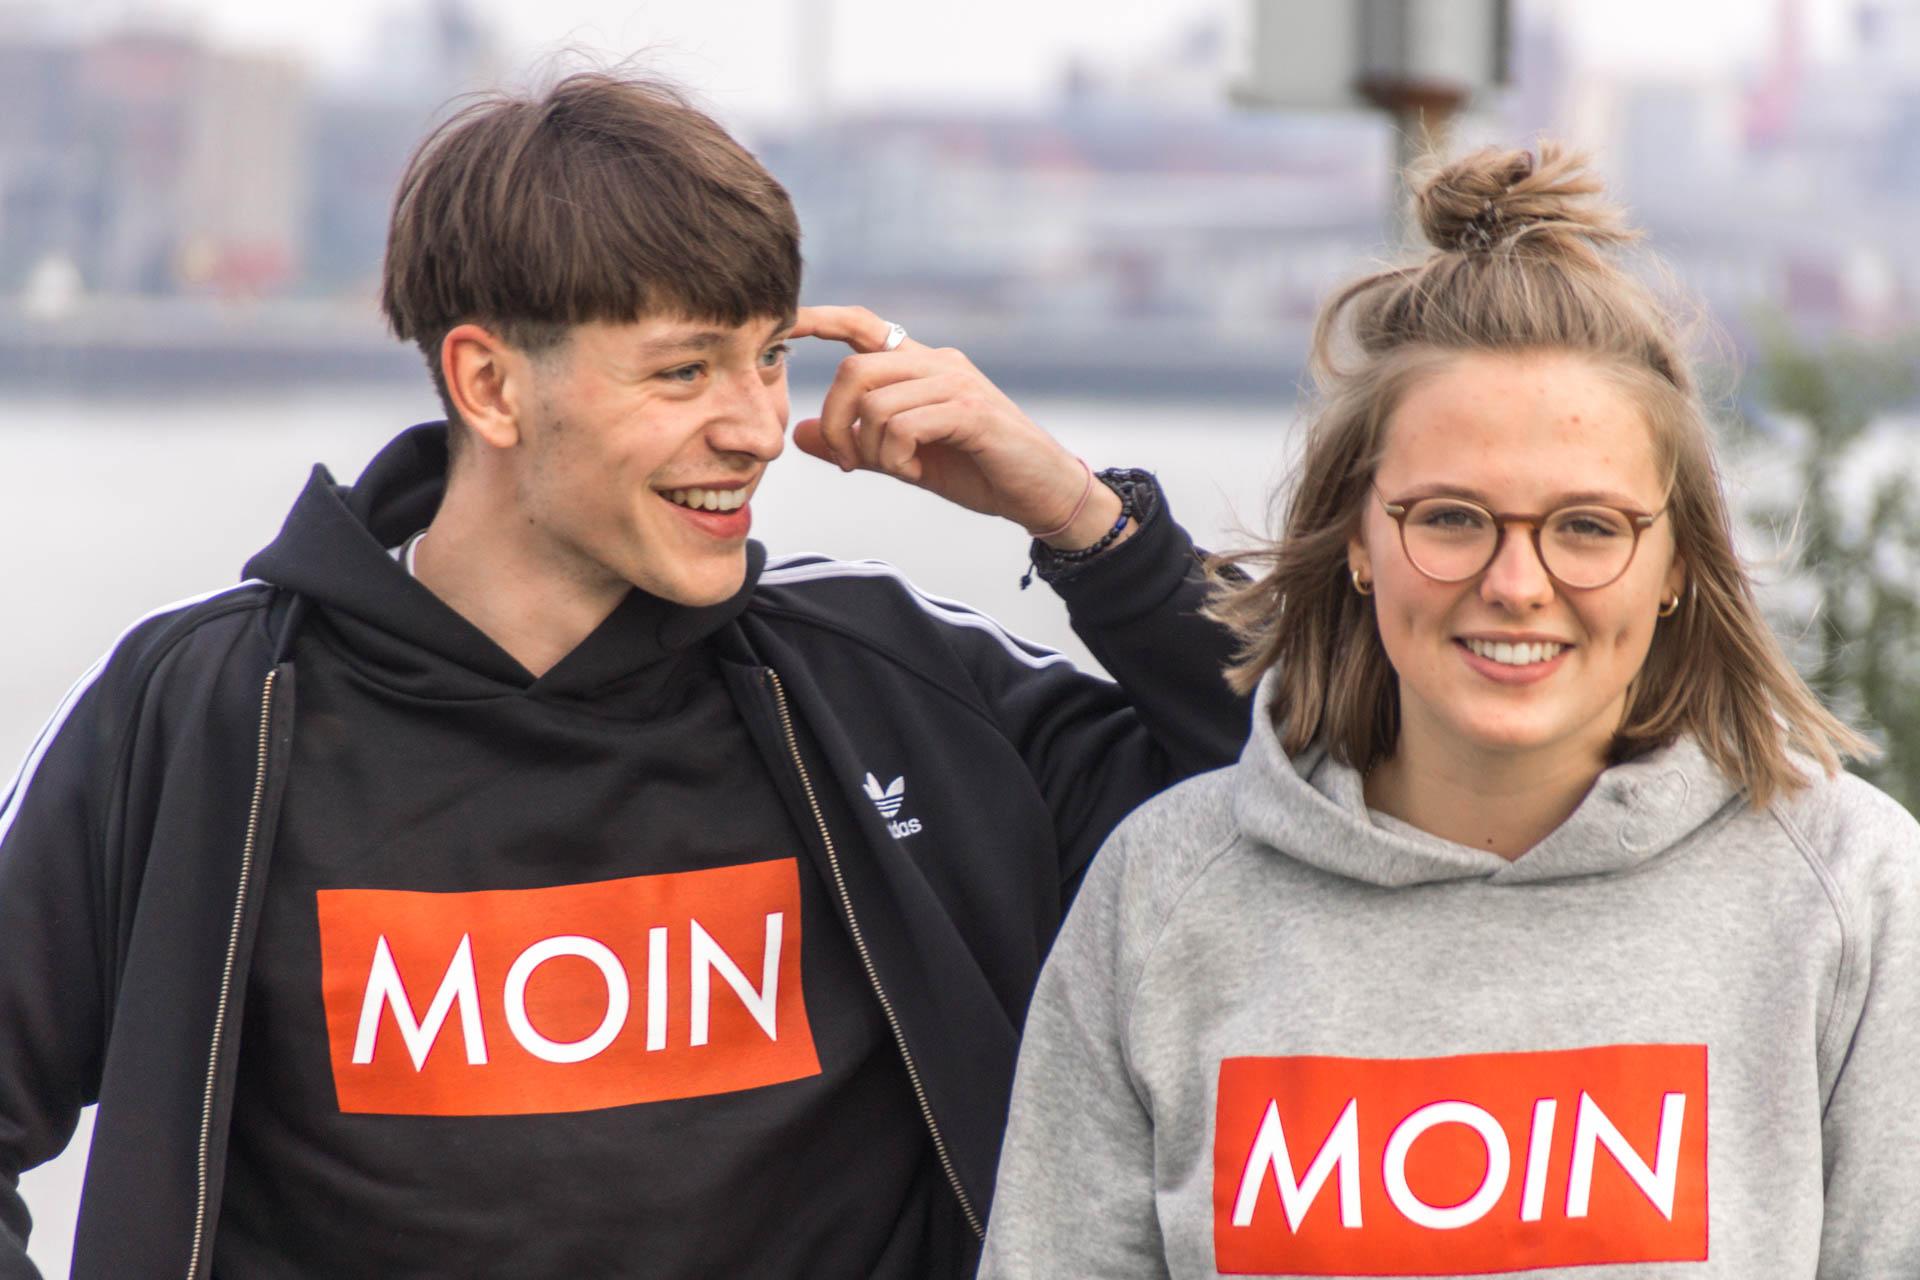 MOIN Hoodie in Bremen